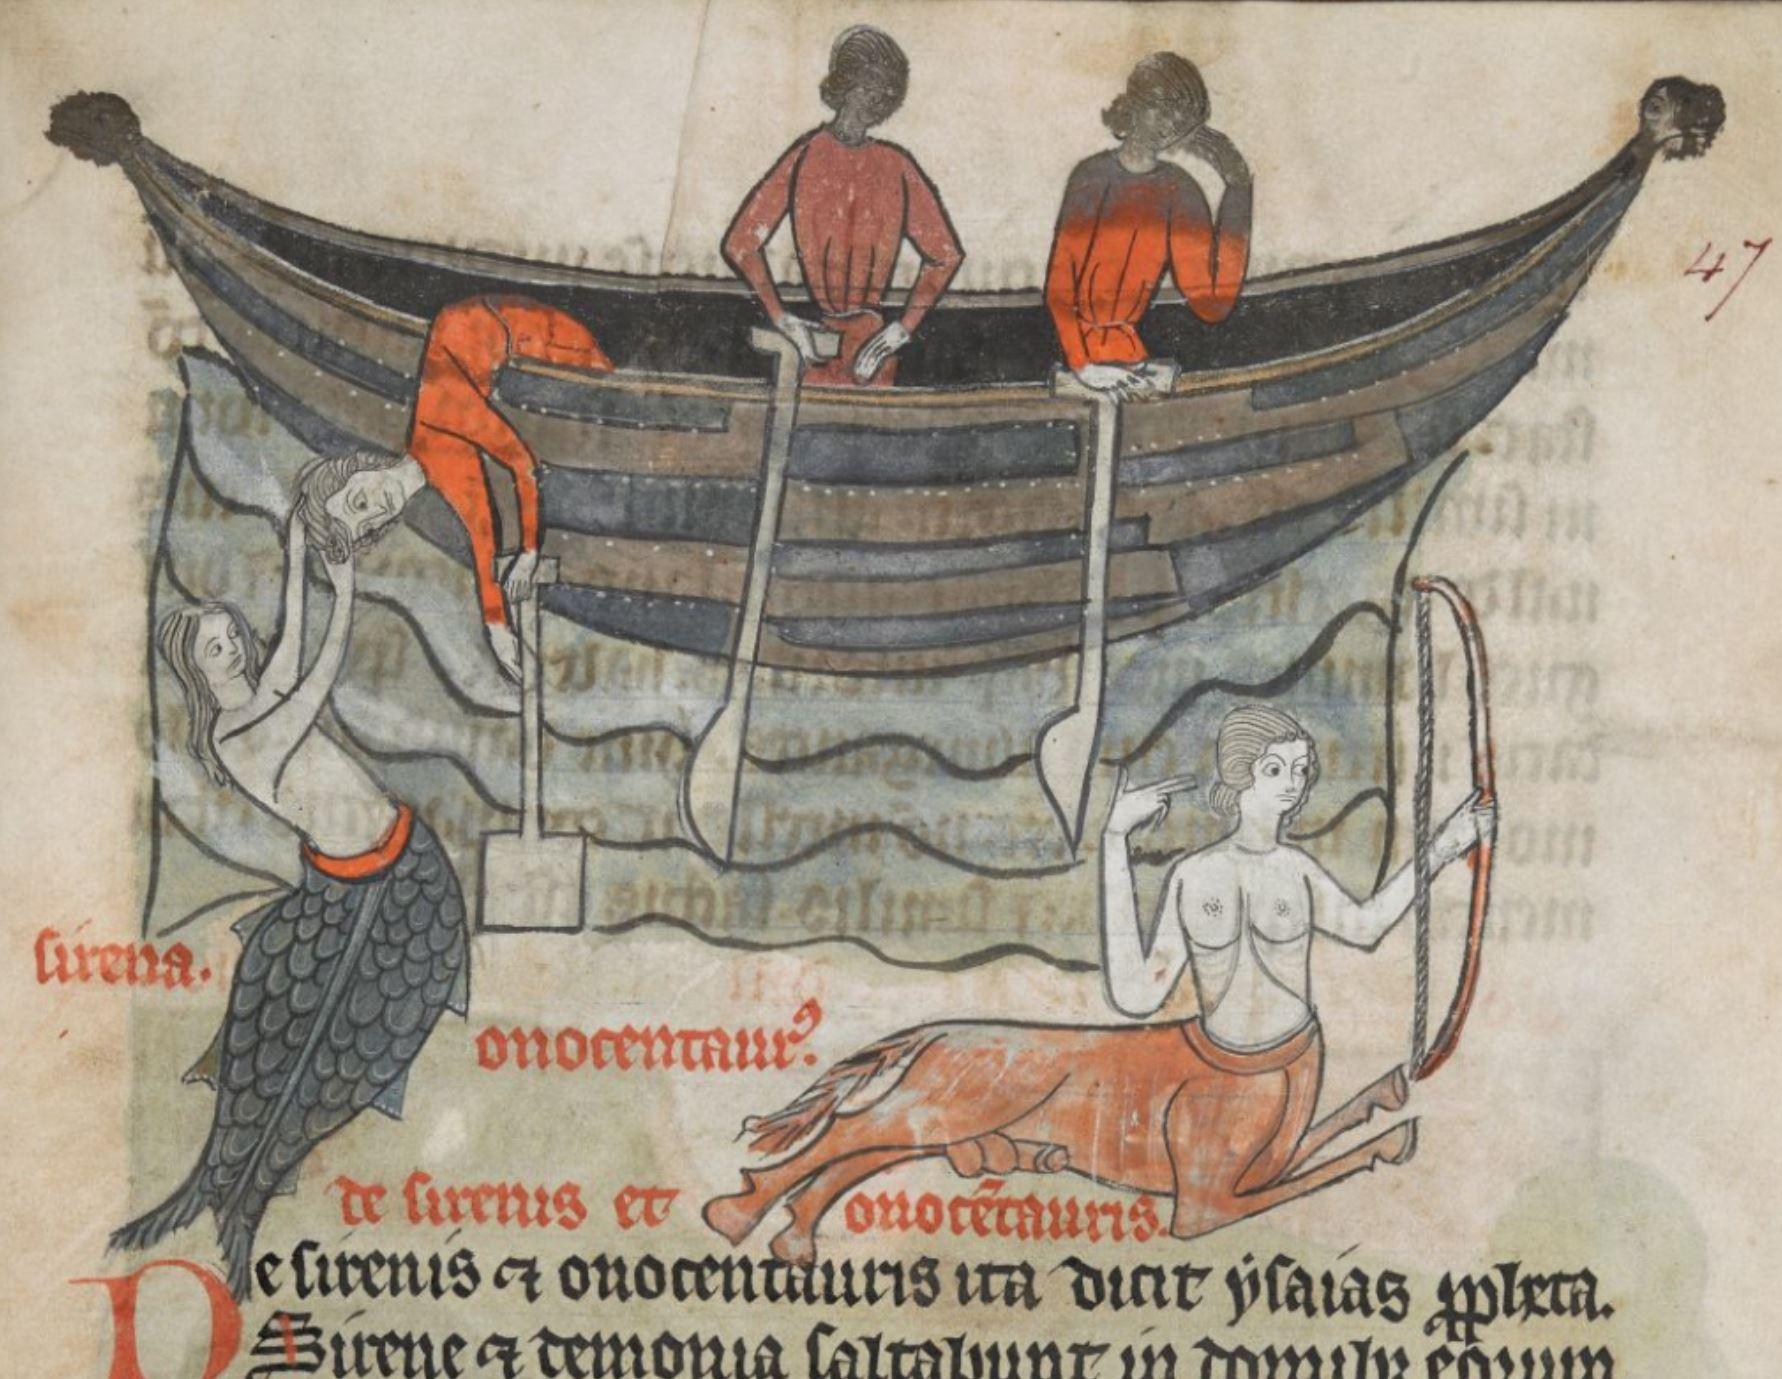 The Medieval Bestiary, Sirena et onocentaurus